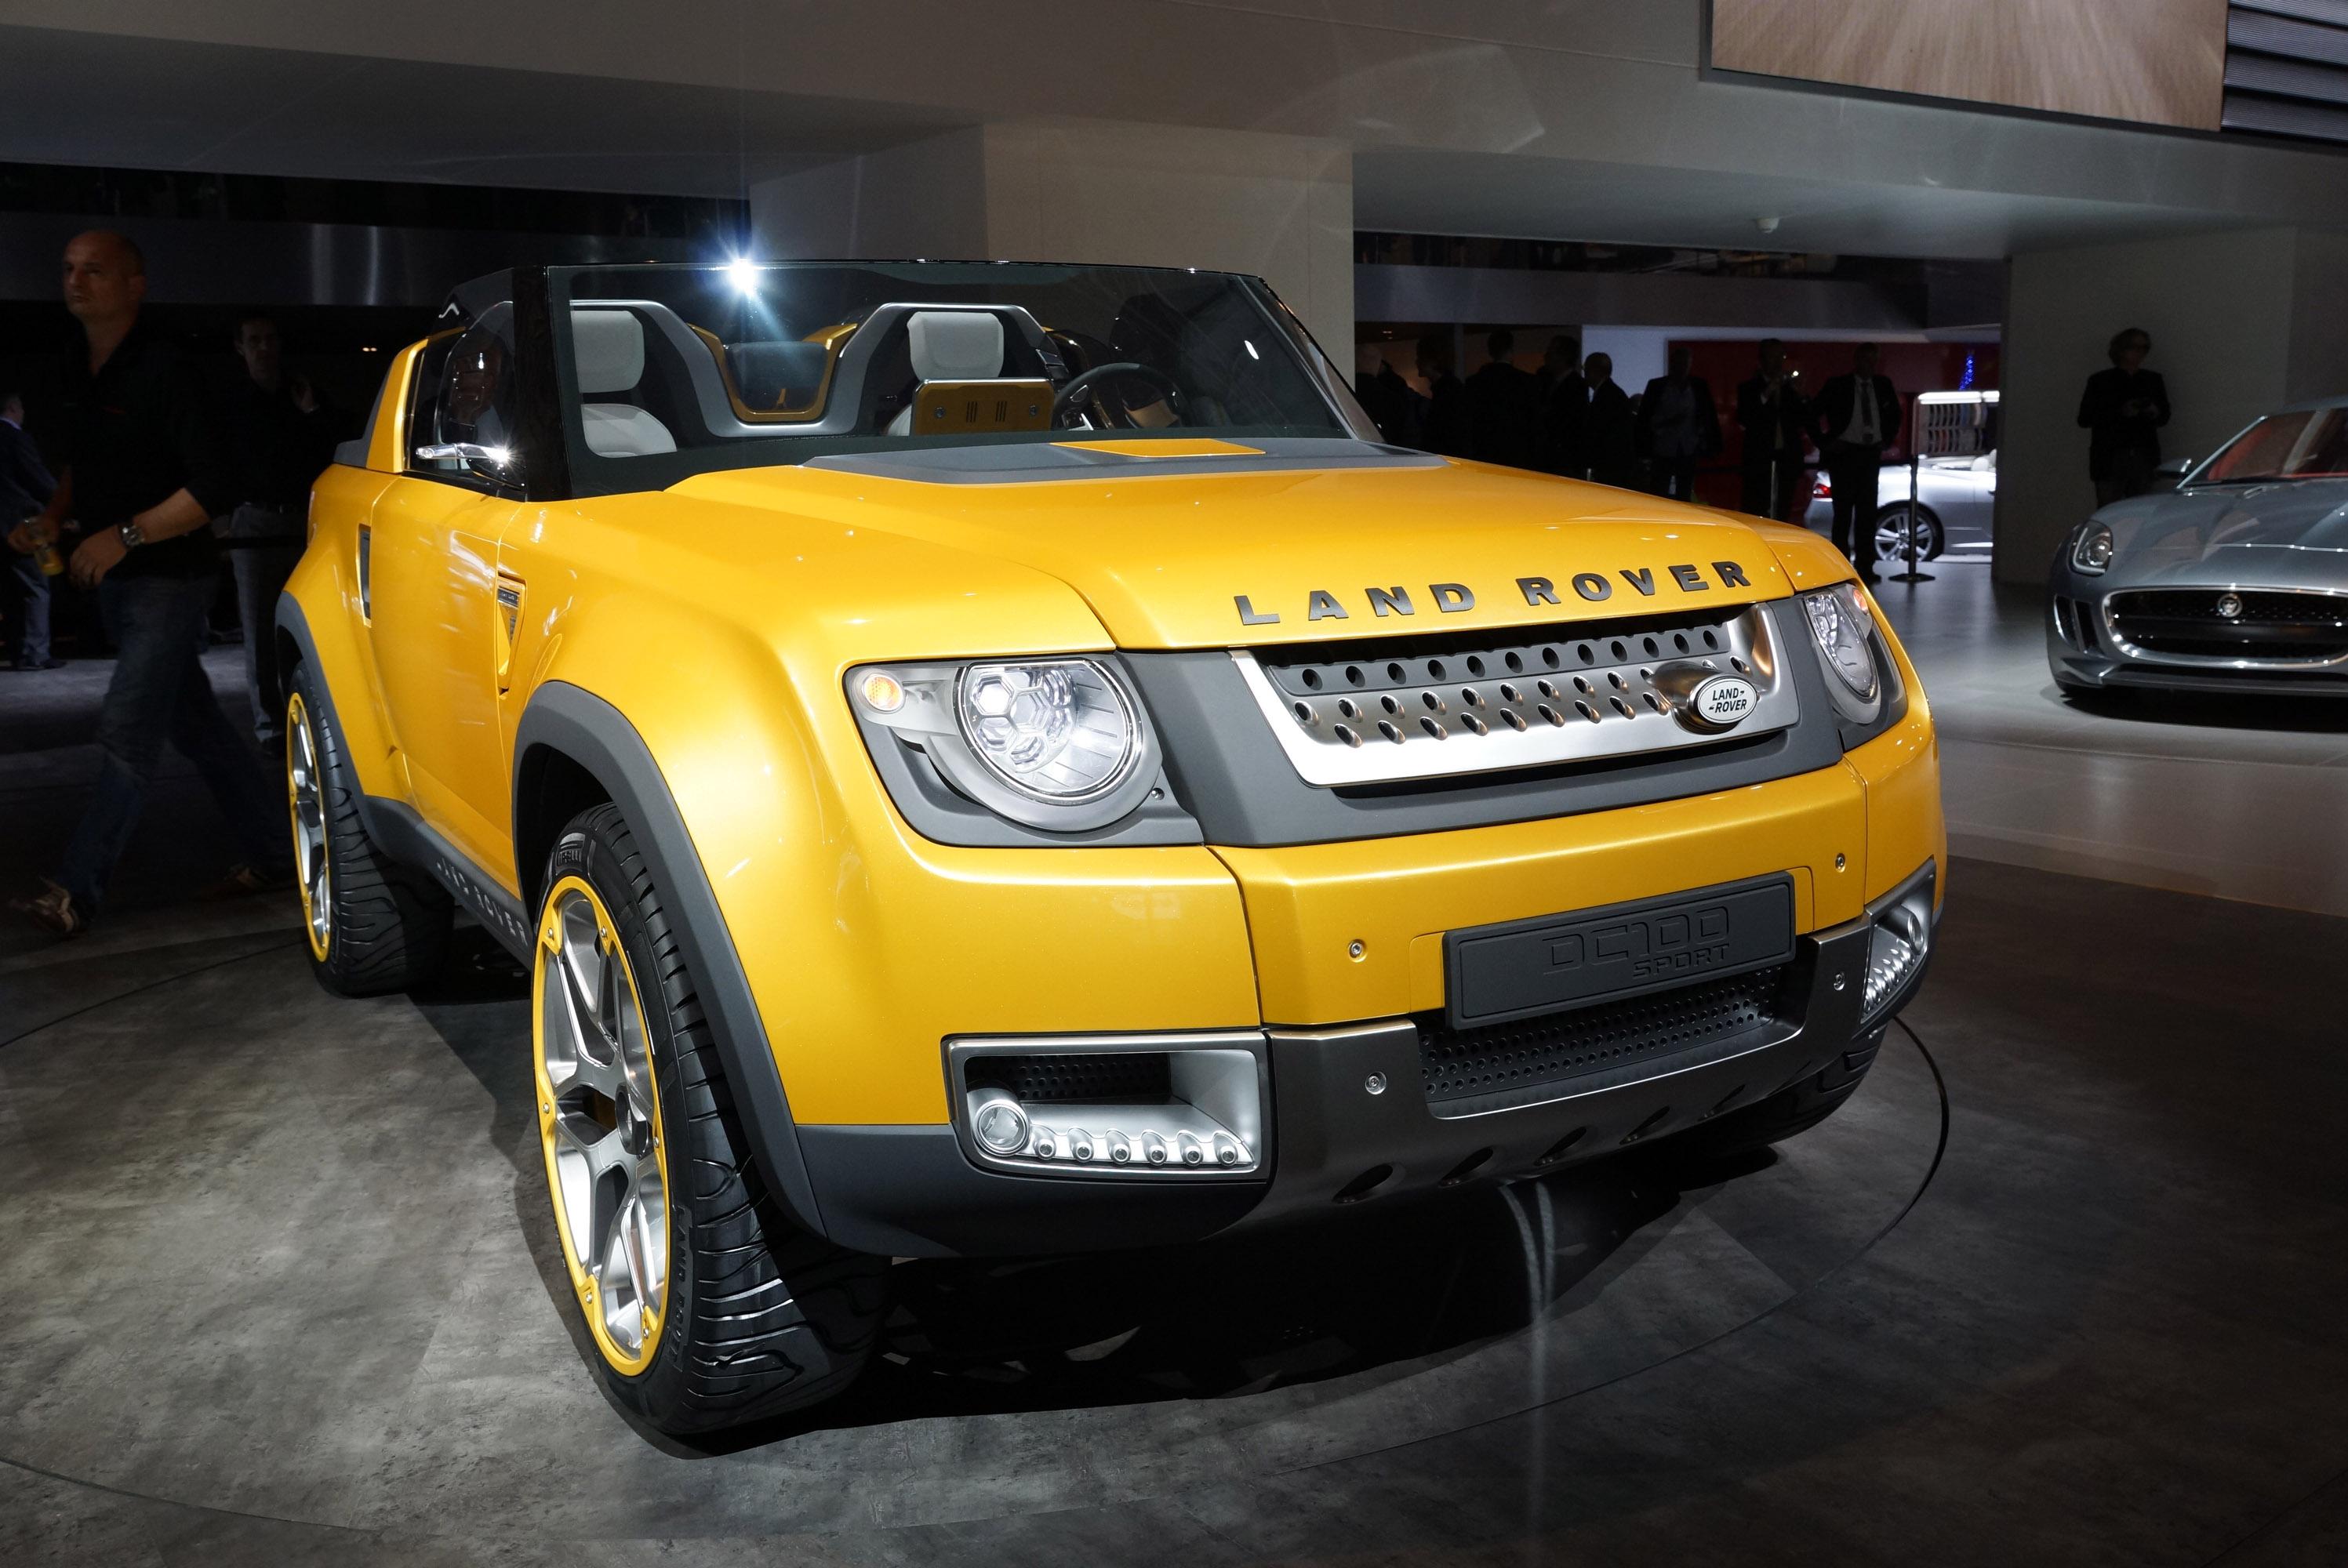 https://www.automobilesreview.com/gallery/land-rover-defender-dc100-sport-frankfurt-2011/land-rover-defender-dc100-sport-frankfurt-2011-03.jpg